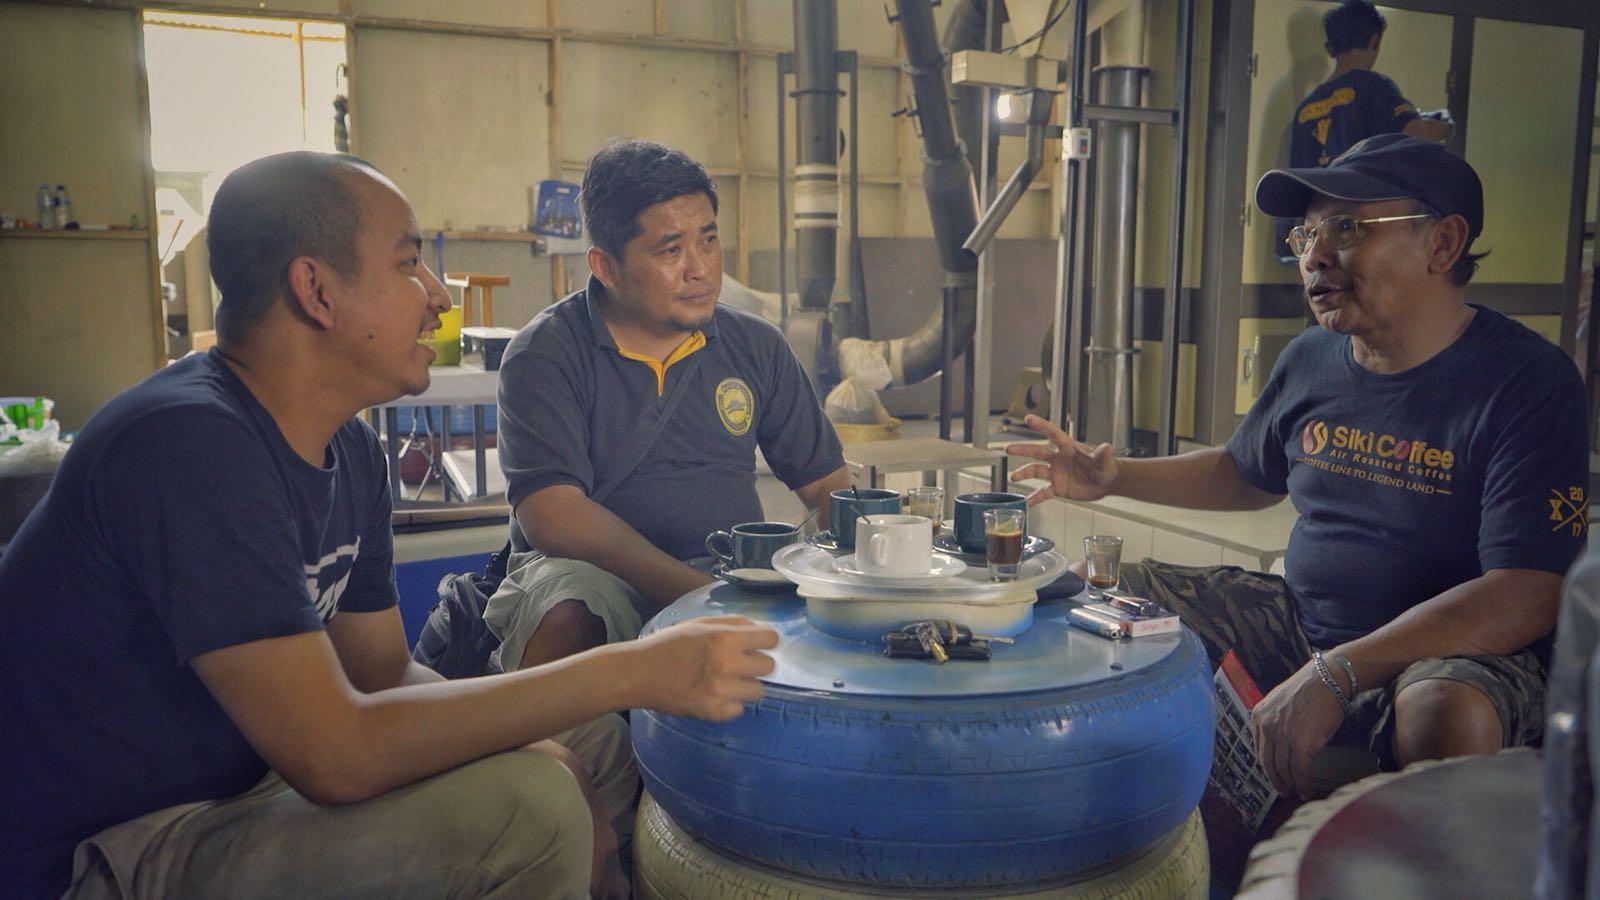 dani rudi and asep at roasting place.jpeg